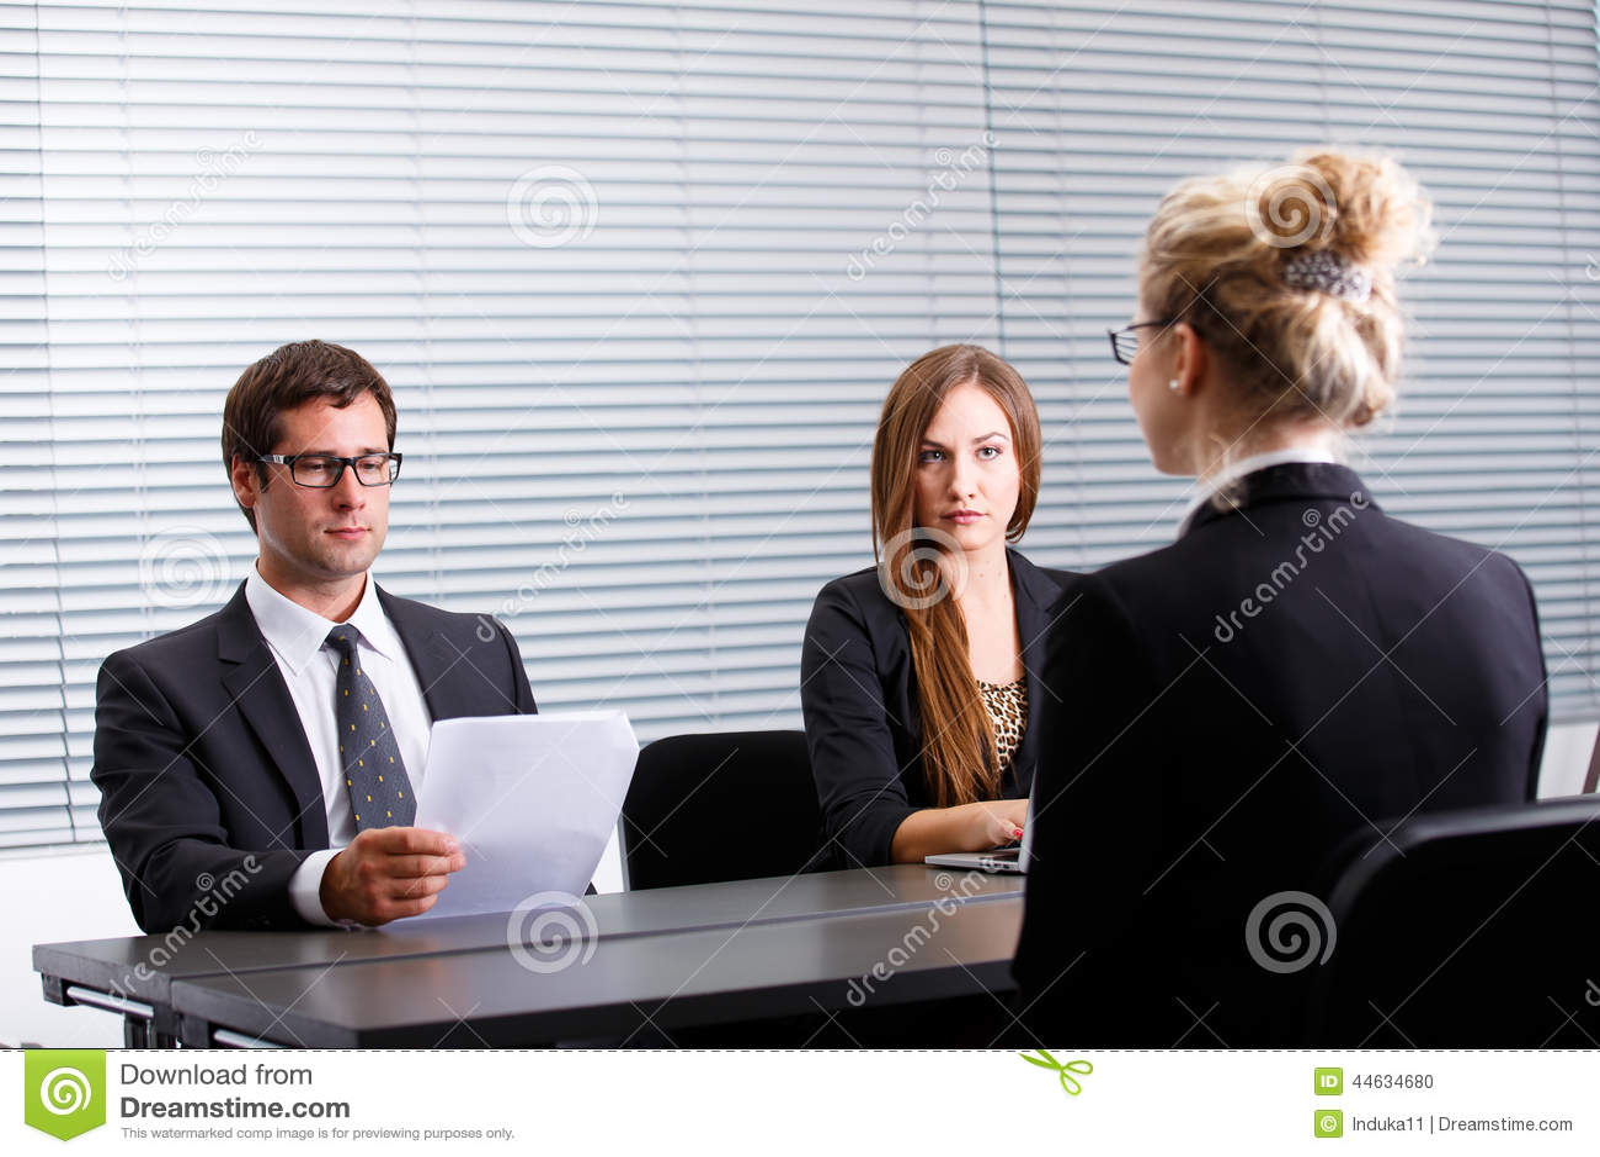 Arbetsintervju